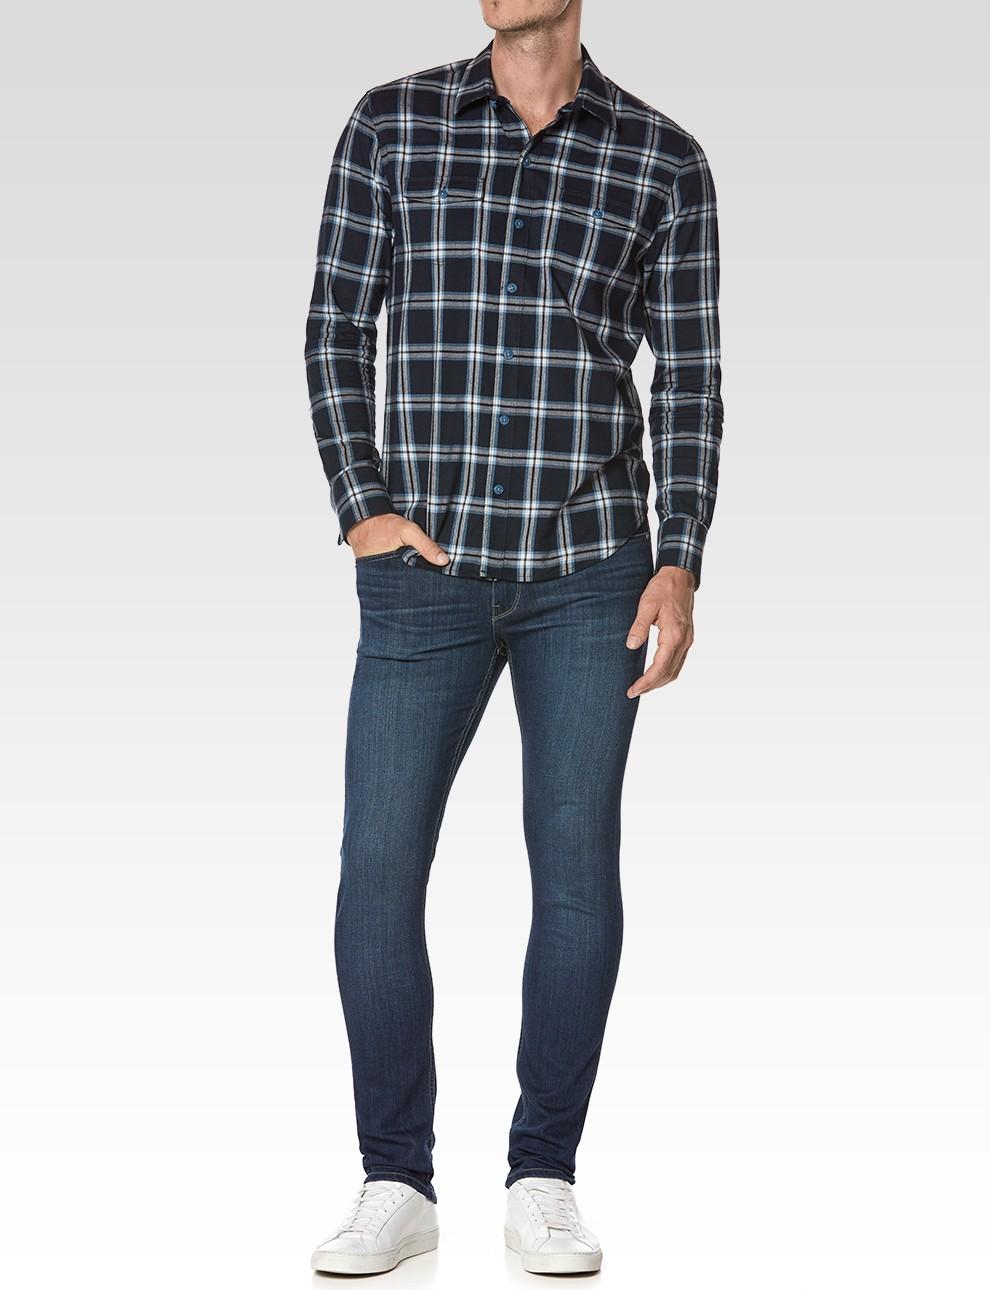 PAIGE Everett Shirt - Blue Mood Harmon Plaid